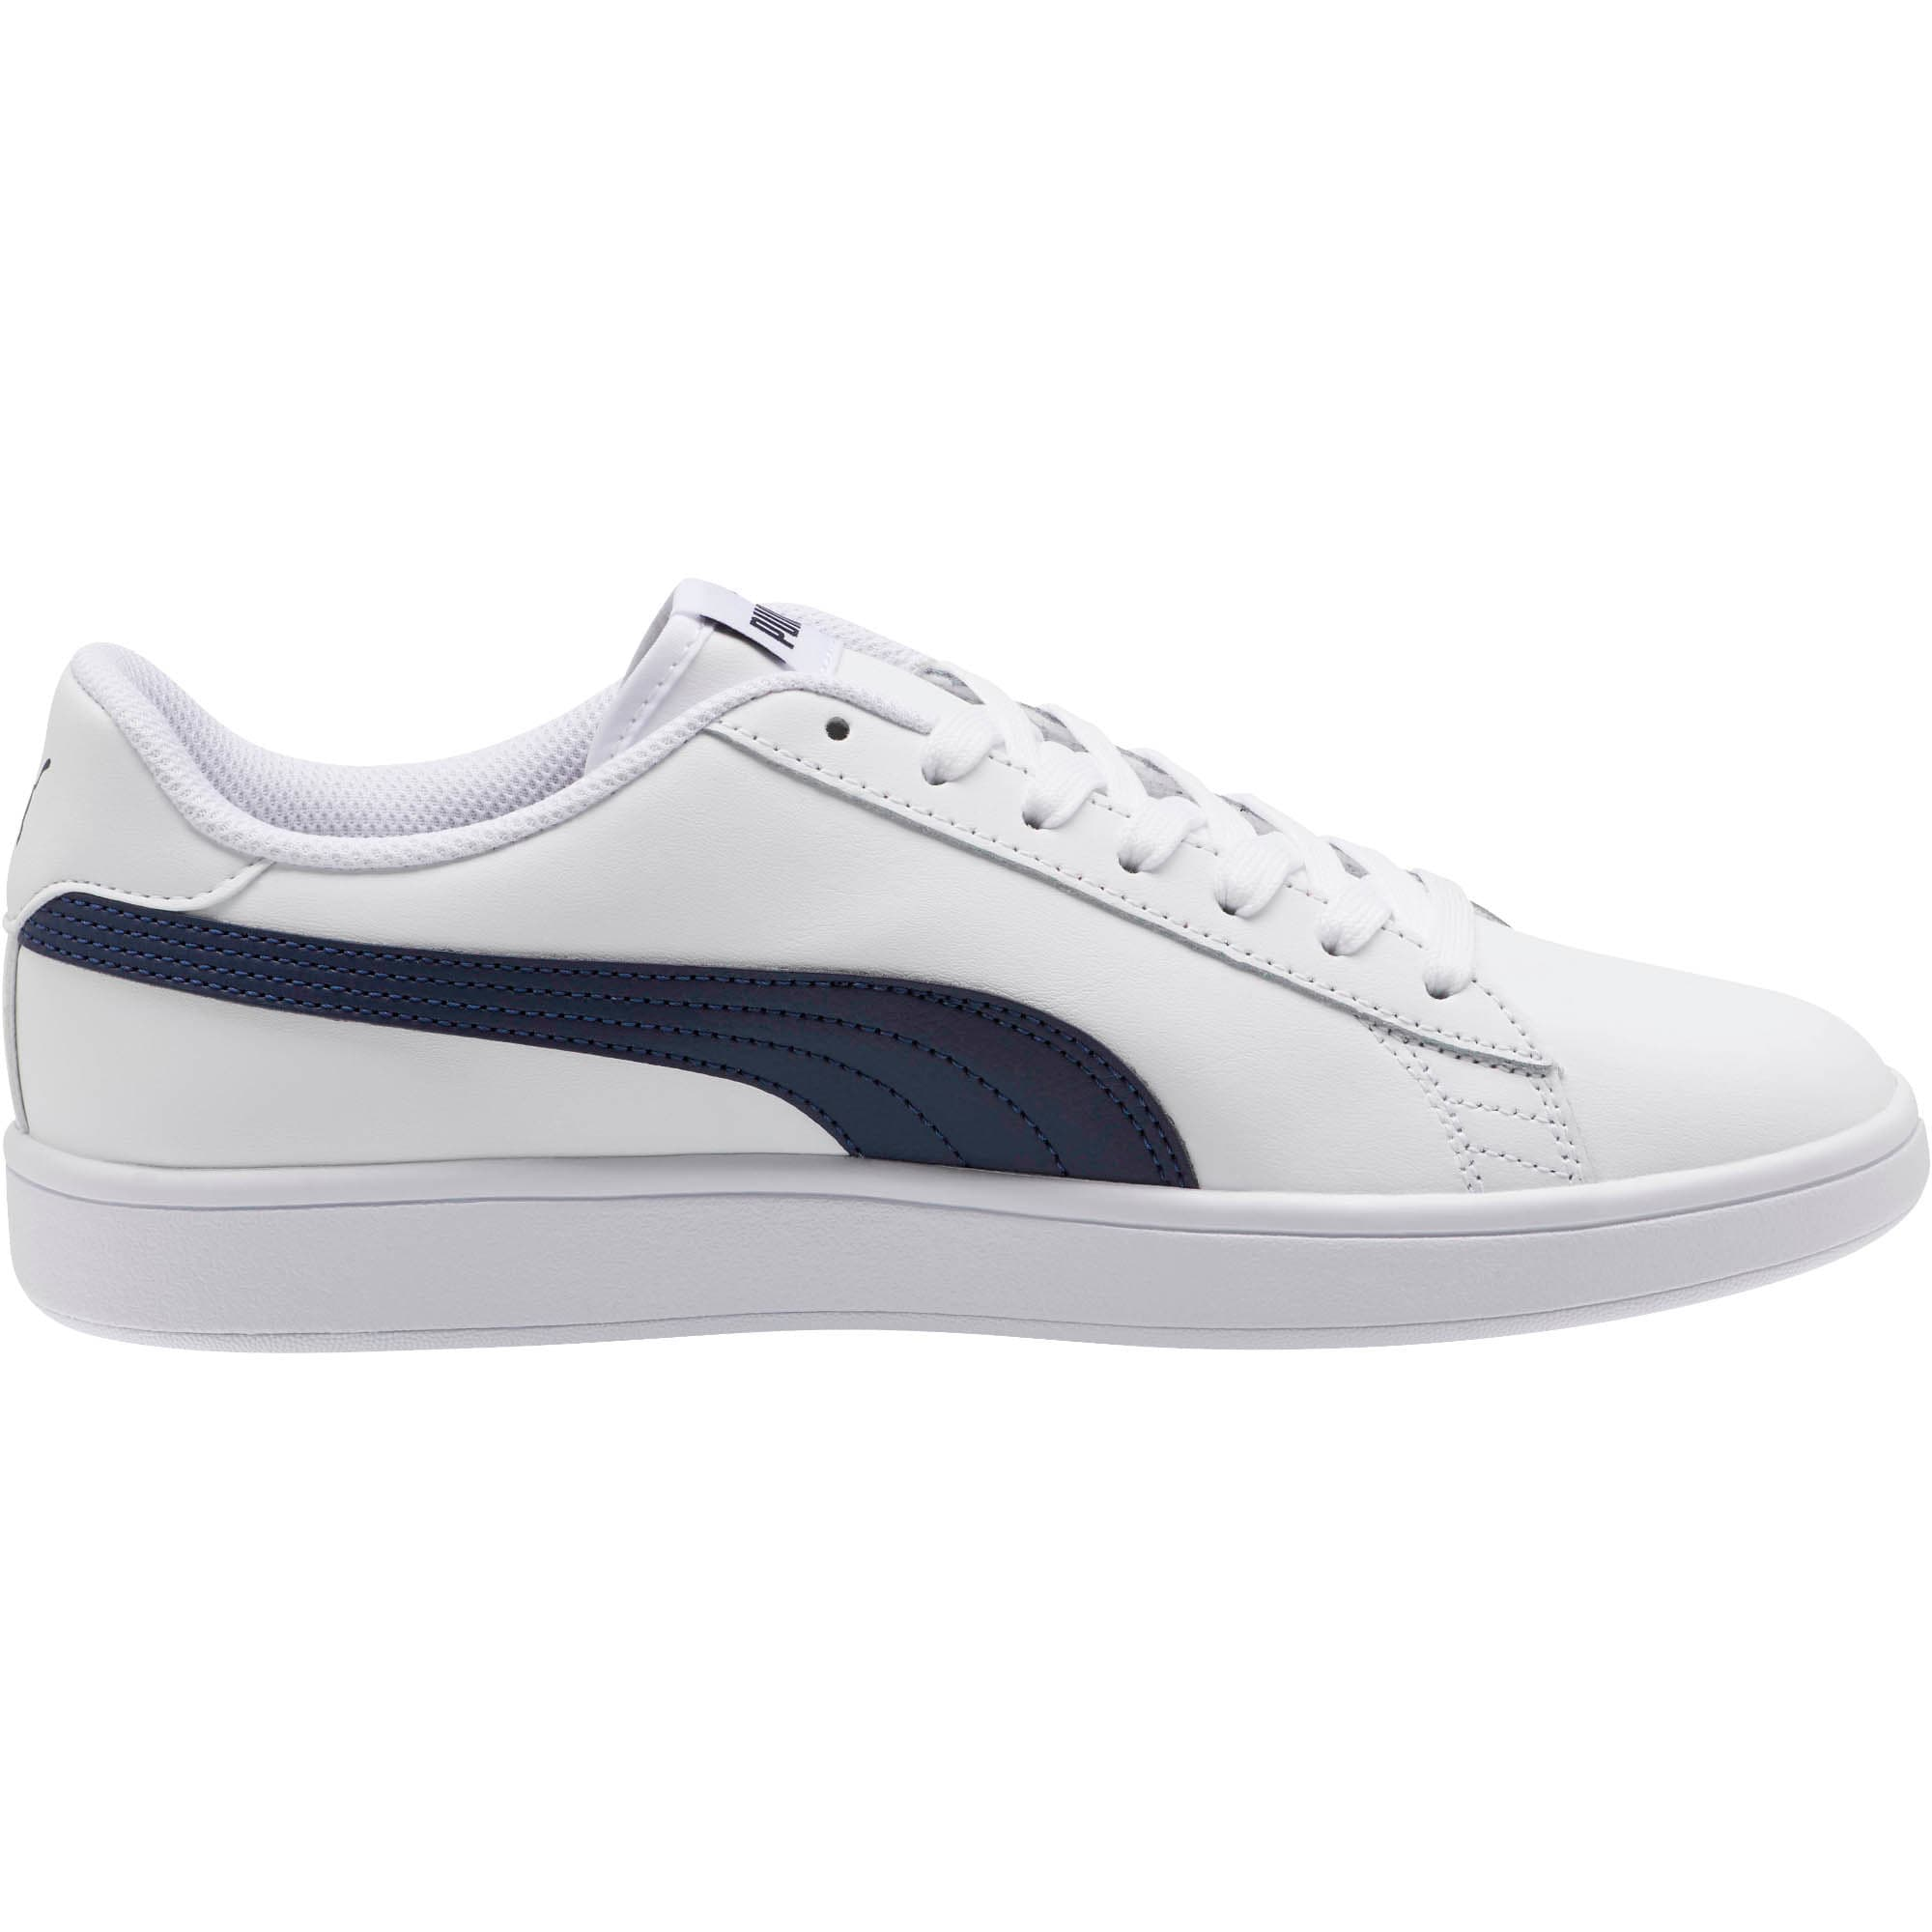 Thumbnail 4 of PUMA Smash v2 Sneakers, Puma White-Peacoat, medium